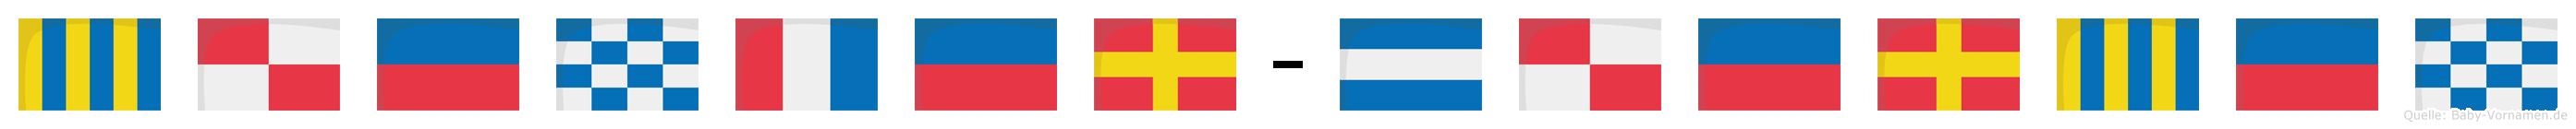 Günter-Jürgen im Flaggenalphabet